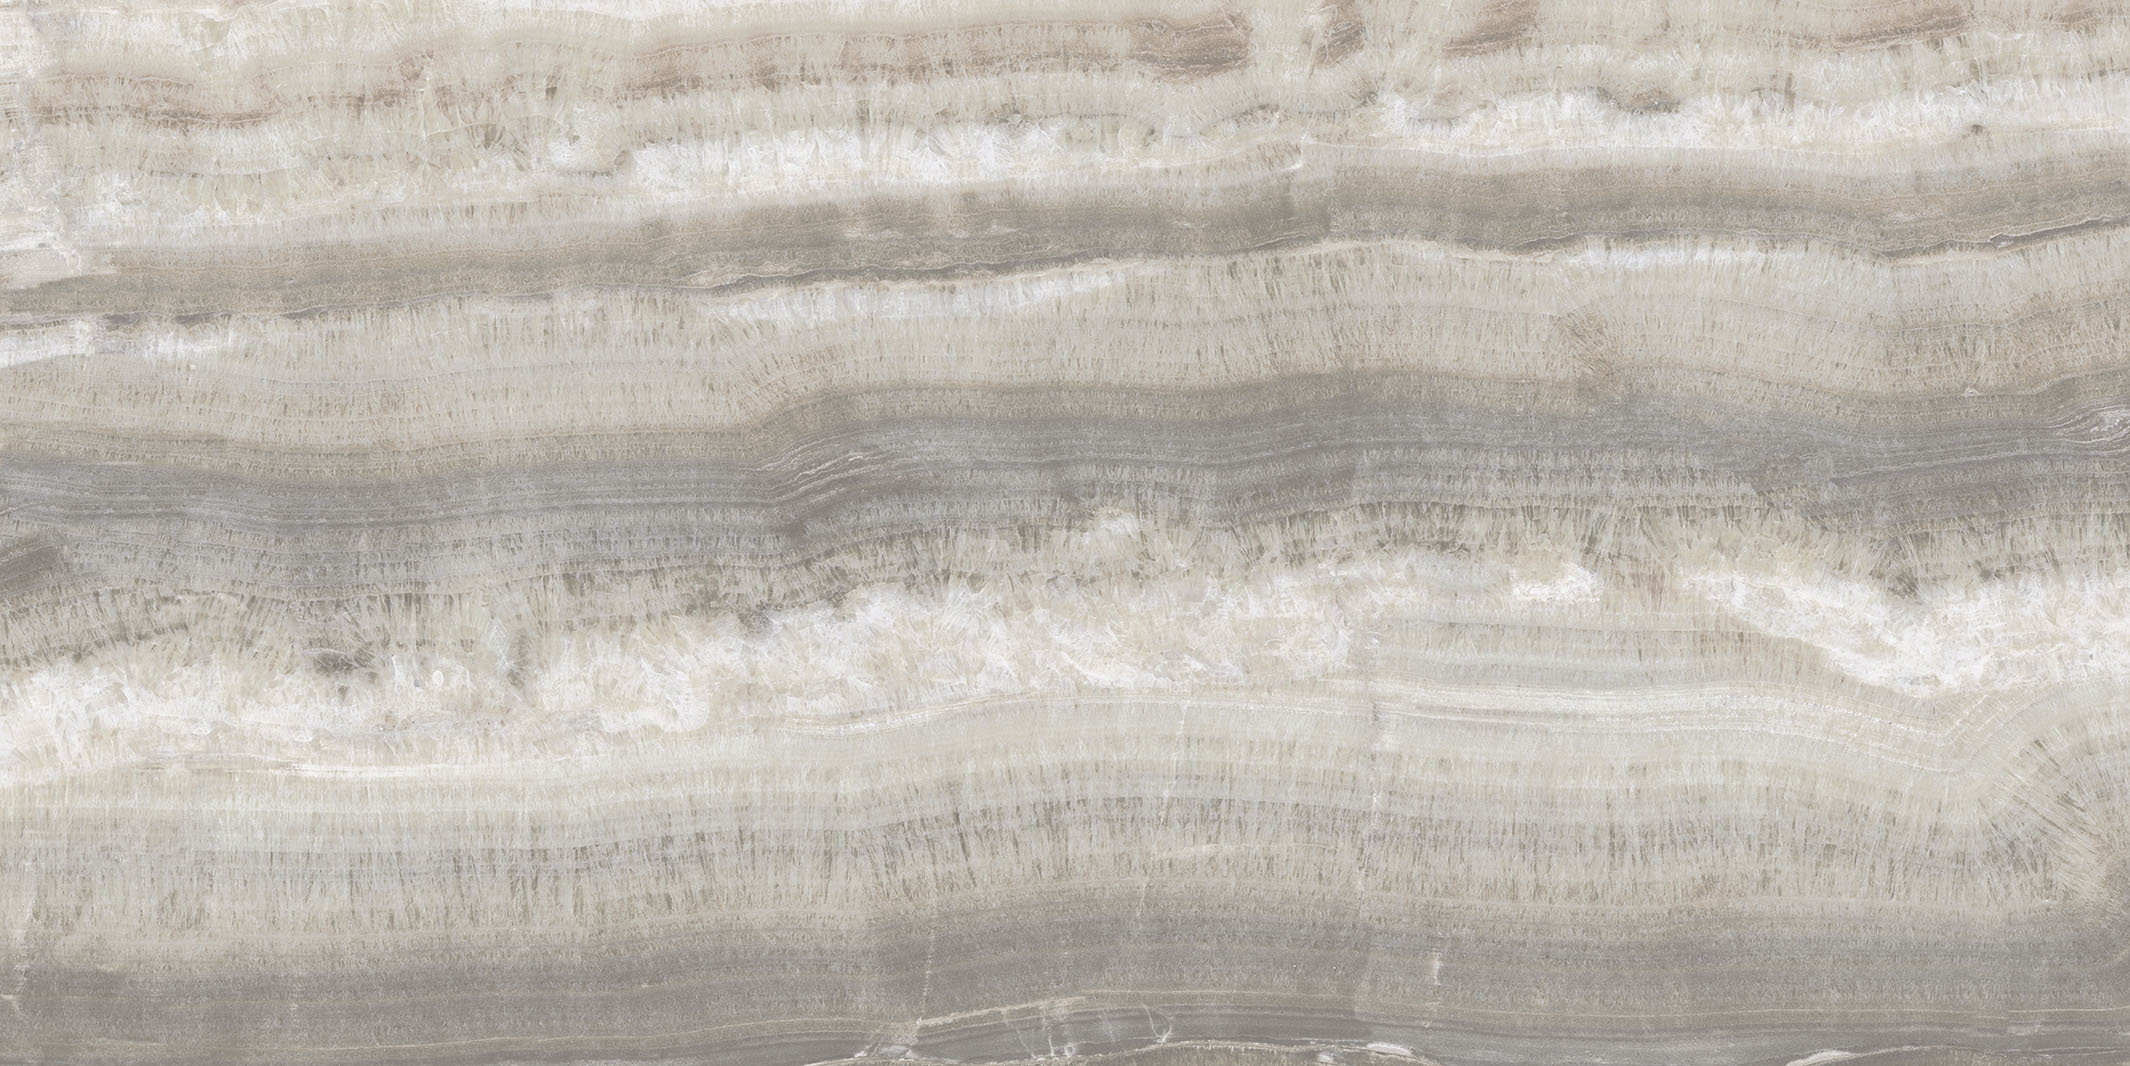 Onyx of Cerim Cloud Glossy 10mm 60 x 120